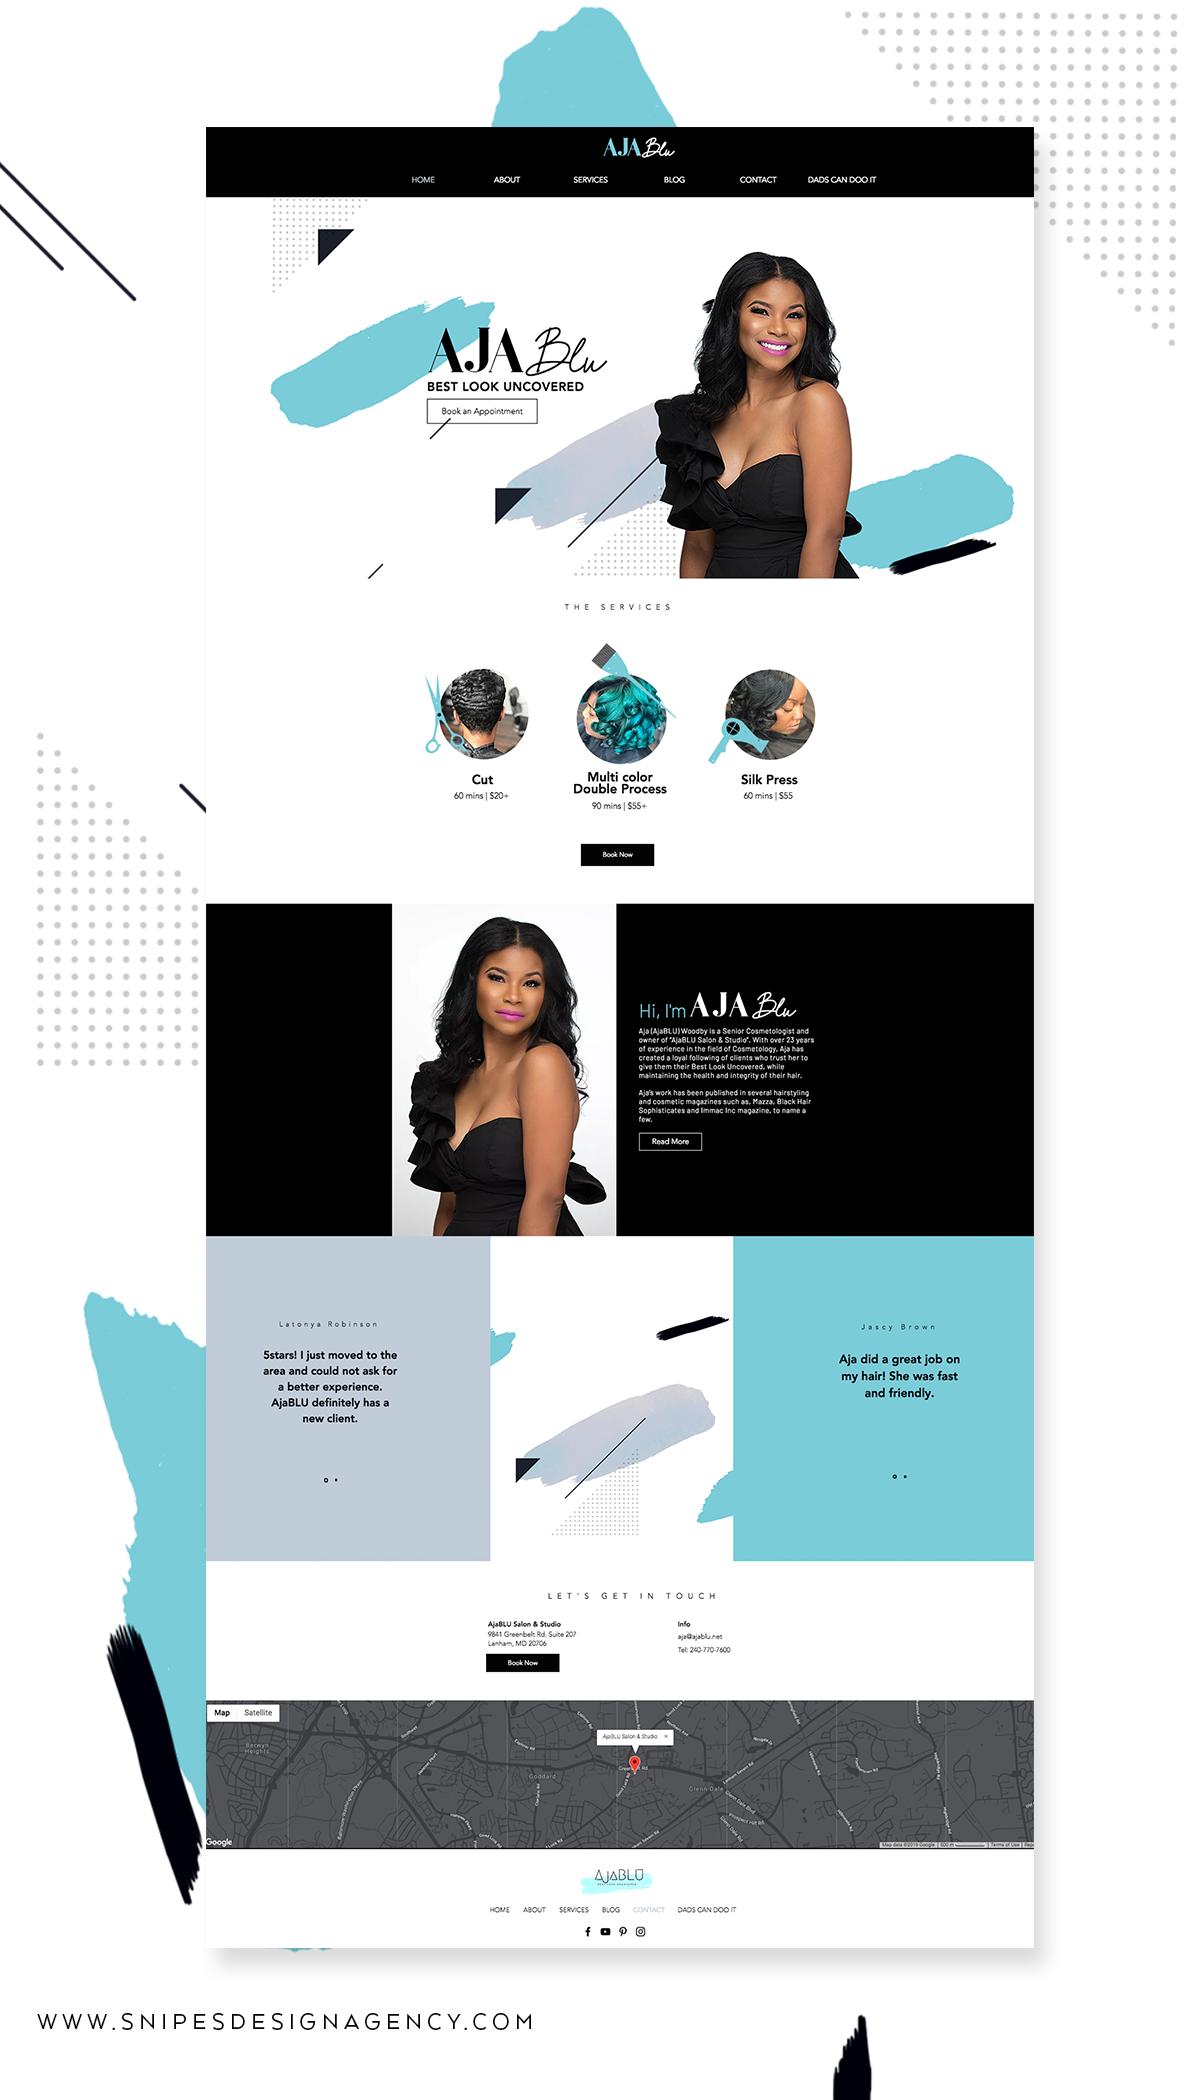 Hair Stylist Website Design Aja Blu Agency Website Design Hair Stylist Logo Design Web Design